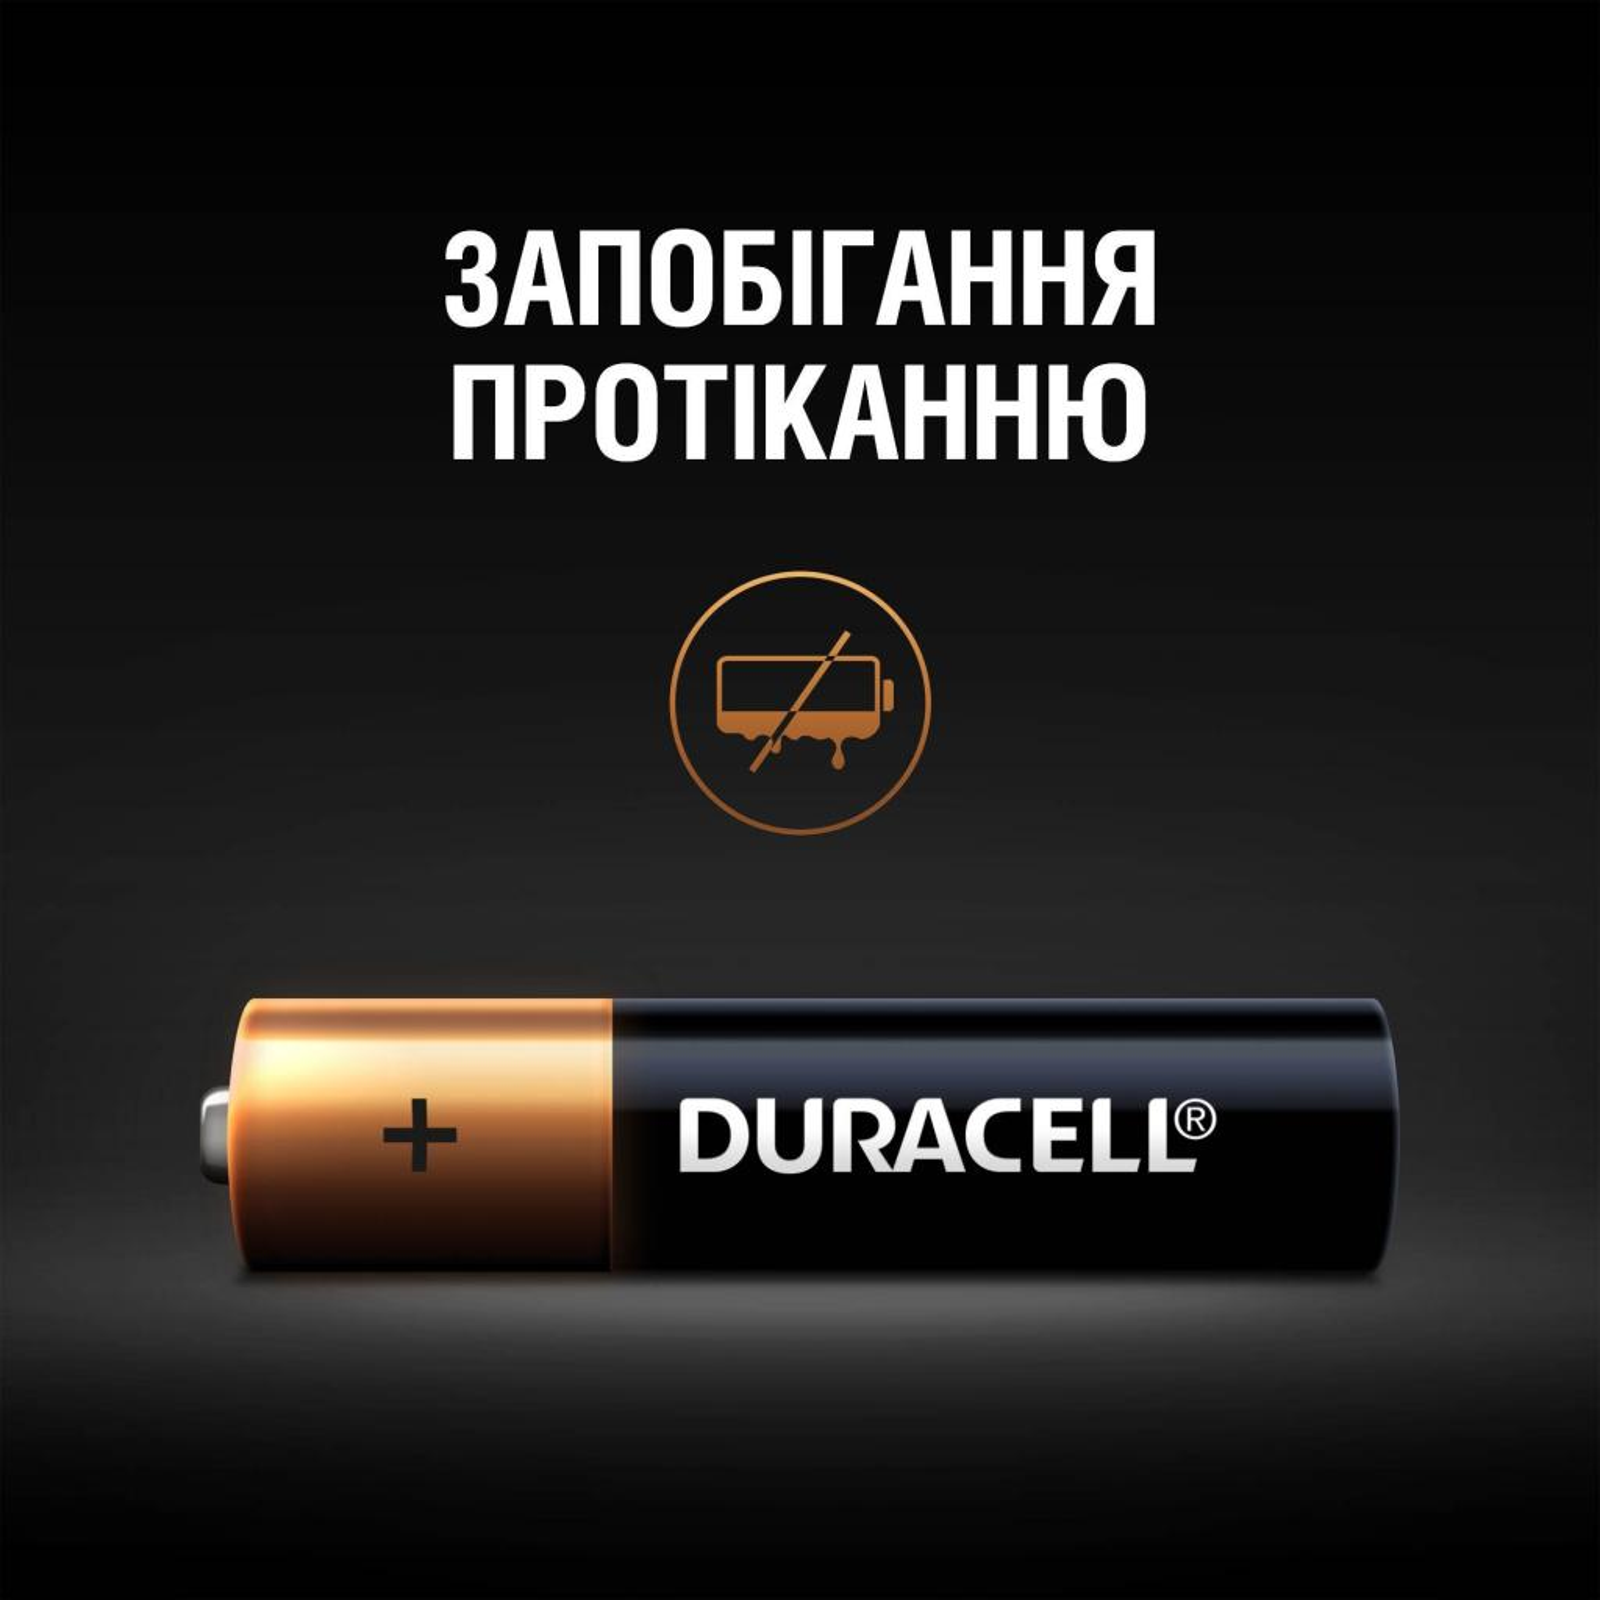 Батарейка Duracell AAA MN2400 LR03 * 8 (5000394203341 / 81480364) изображение 5